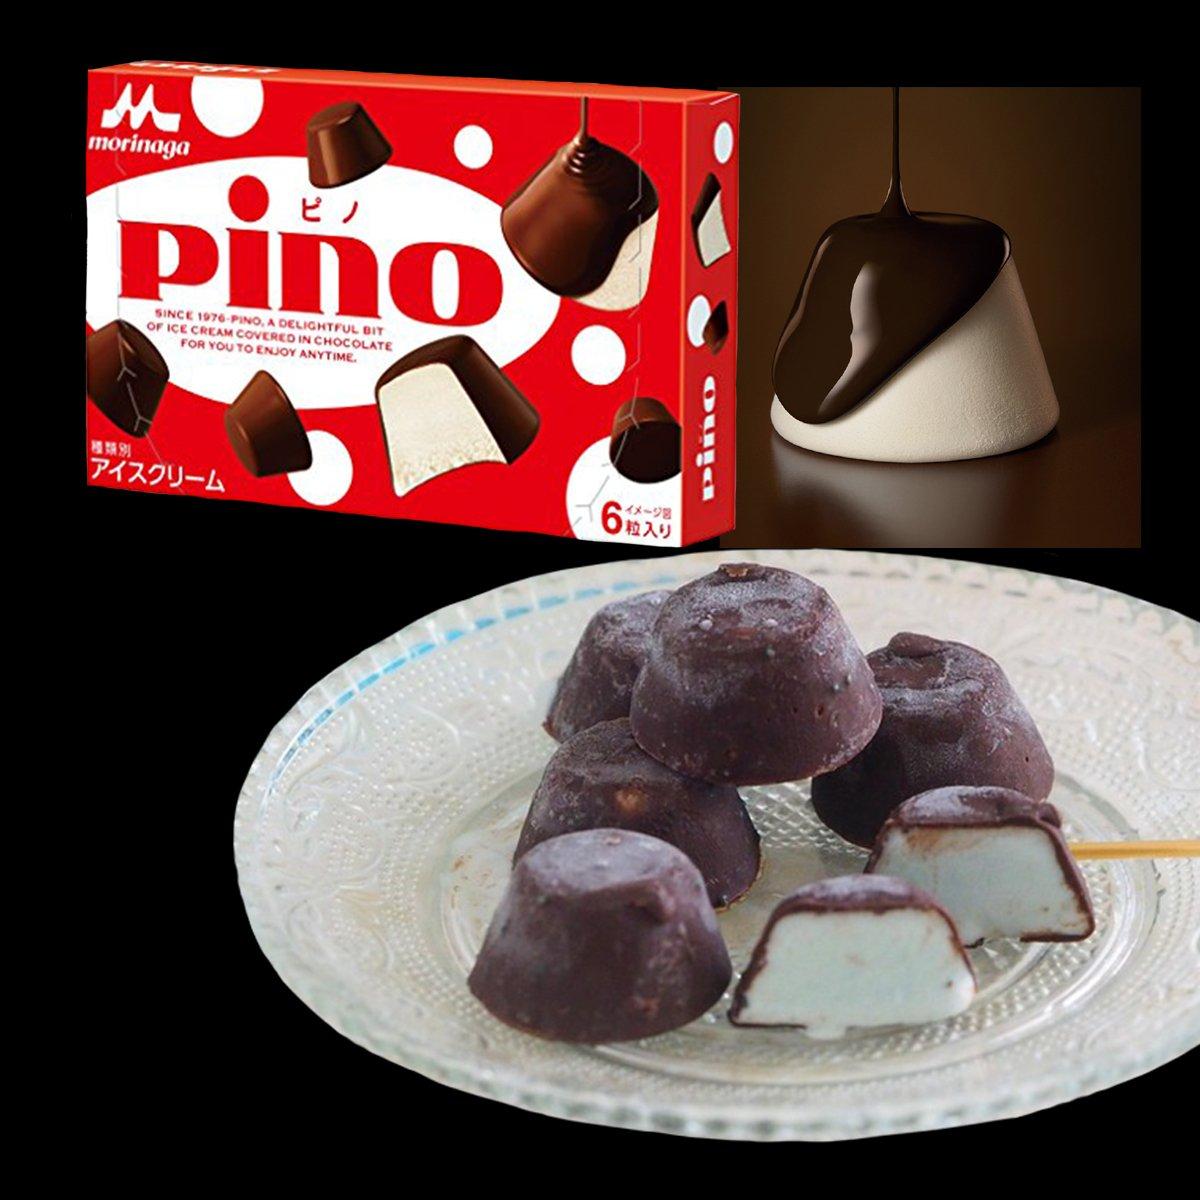 Morinaga Pino Case Chocolate Vanilla Ice Cream (24pkts) / 森永PINO業務用ケース 24個入